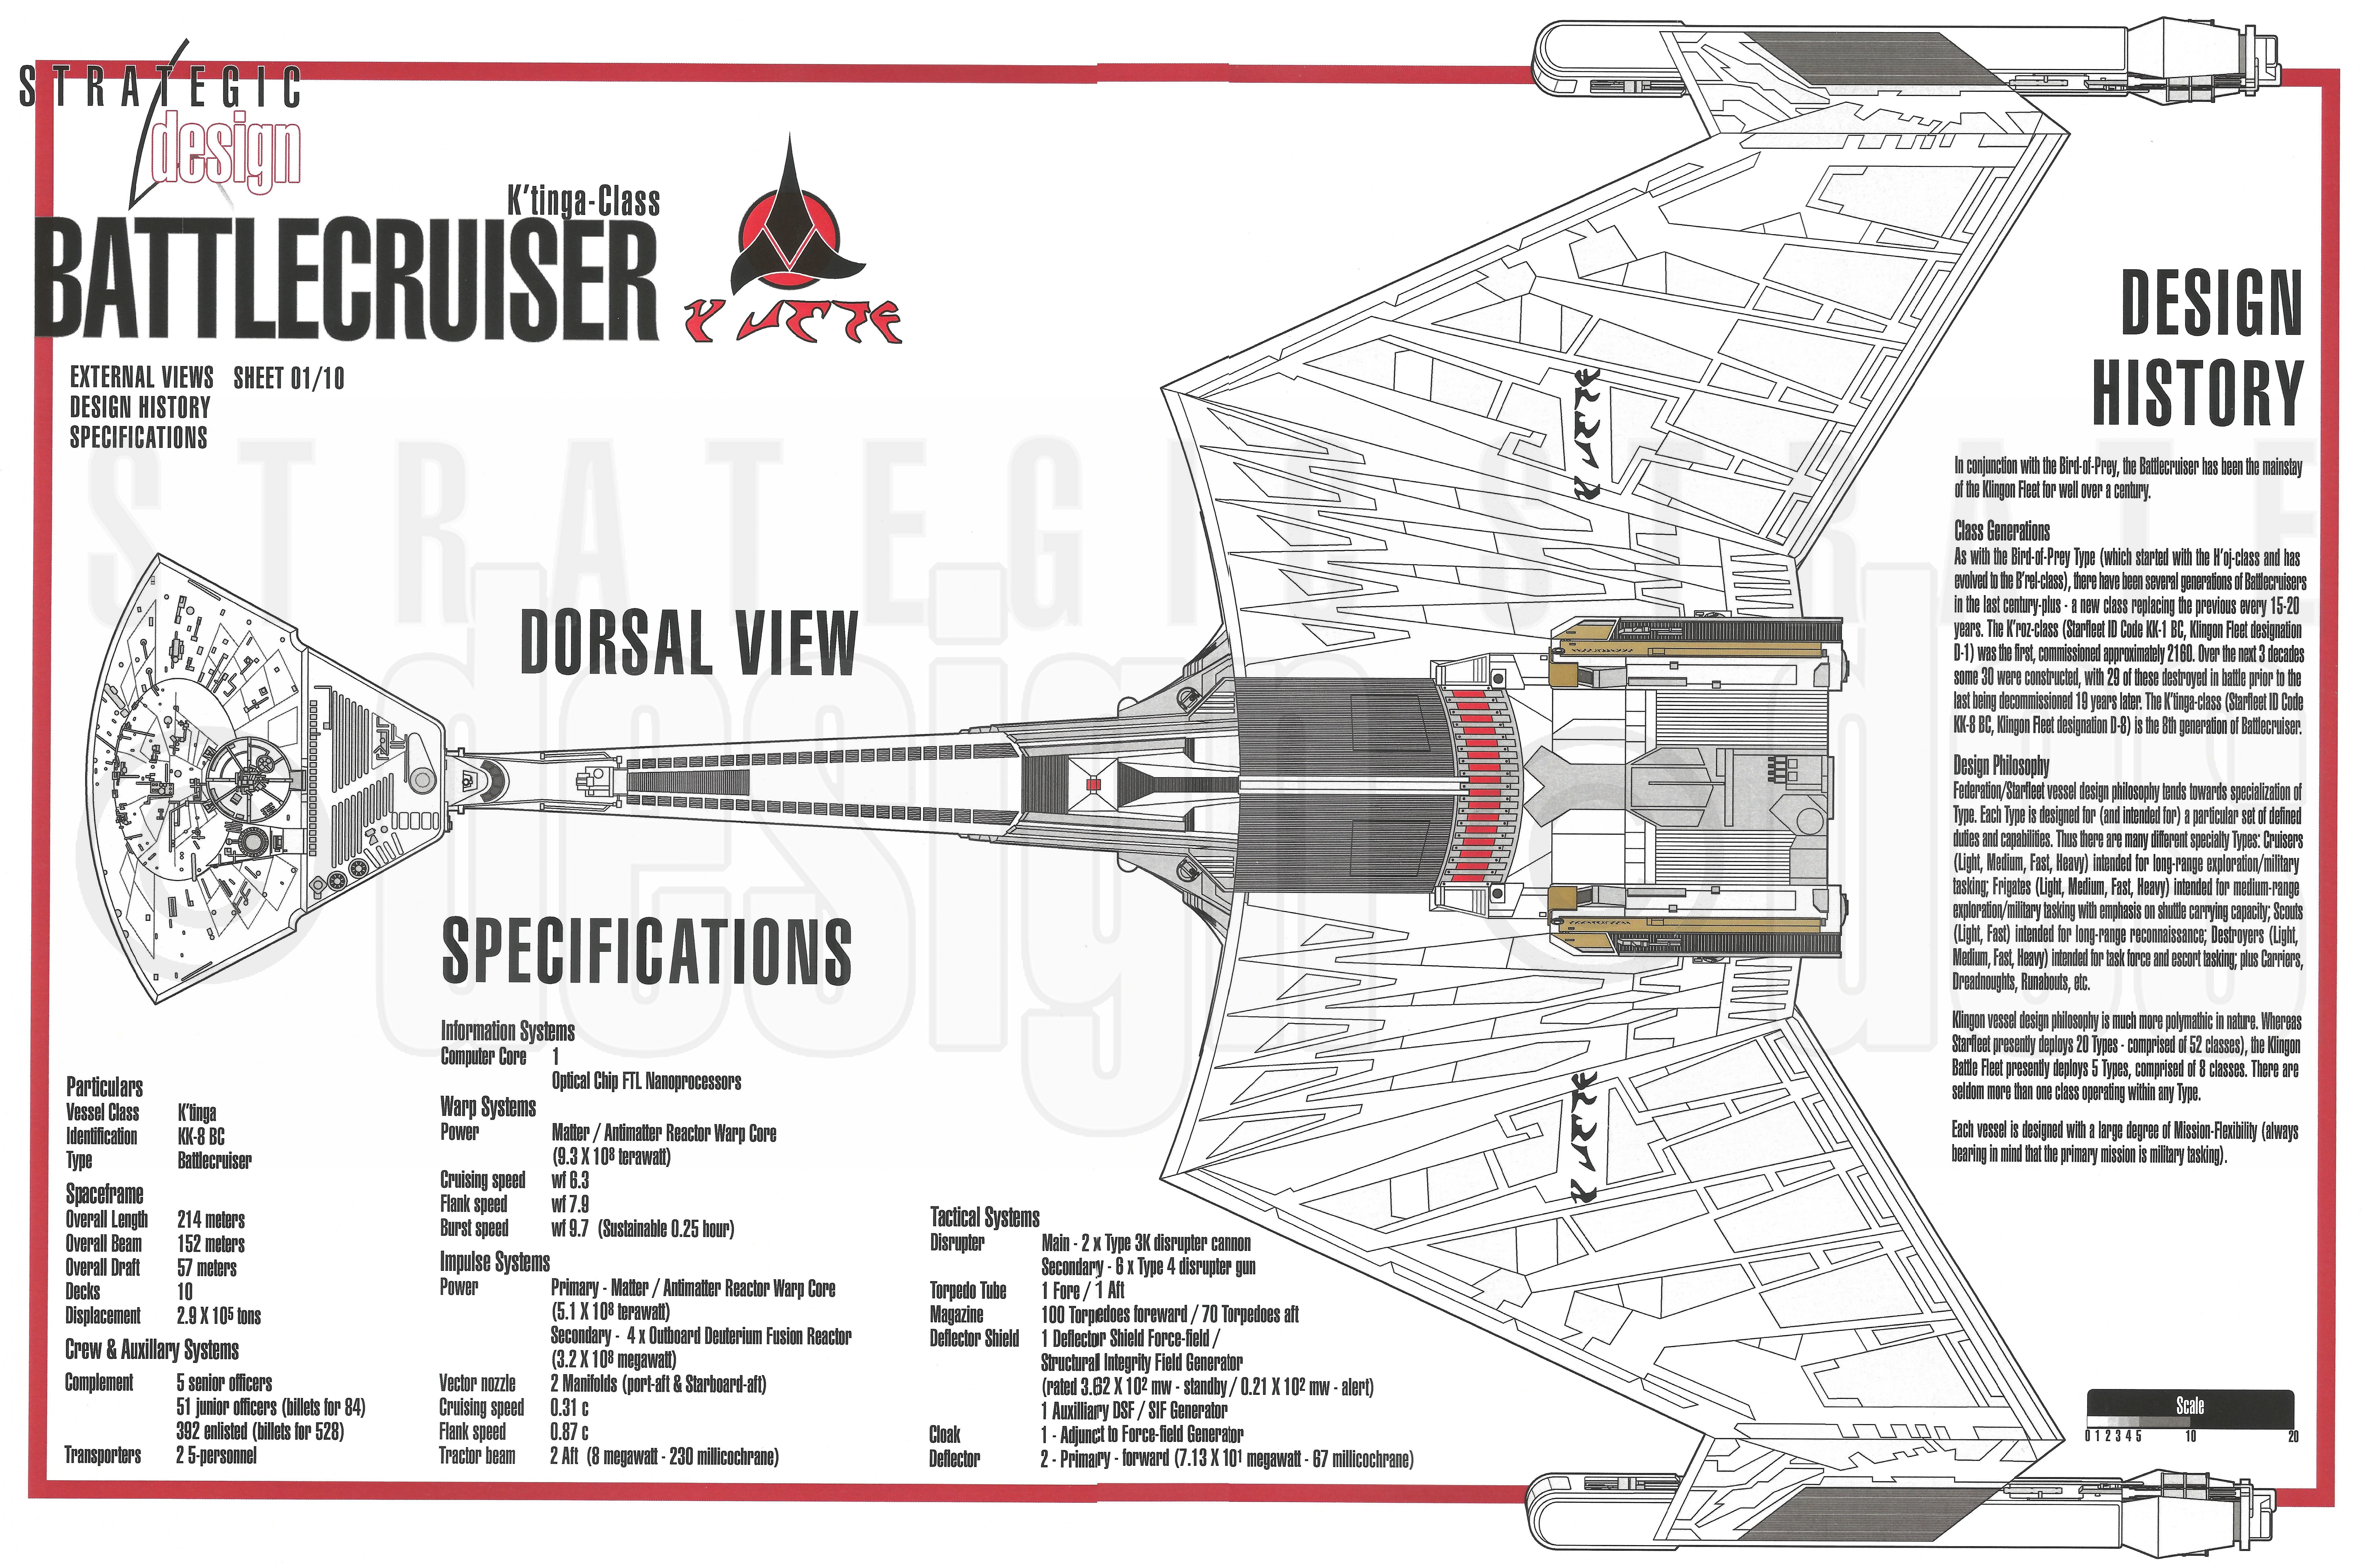 Star trek blueprints klingon ktinga class battlecruiser ktinga class battlecruiser malvernweather Image collections